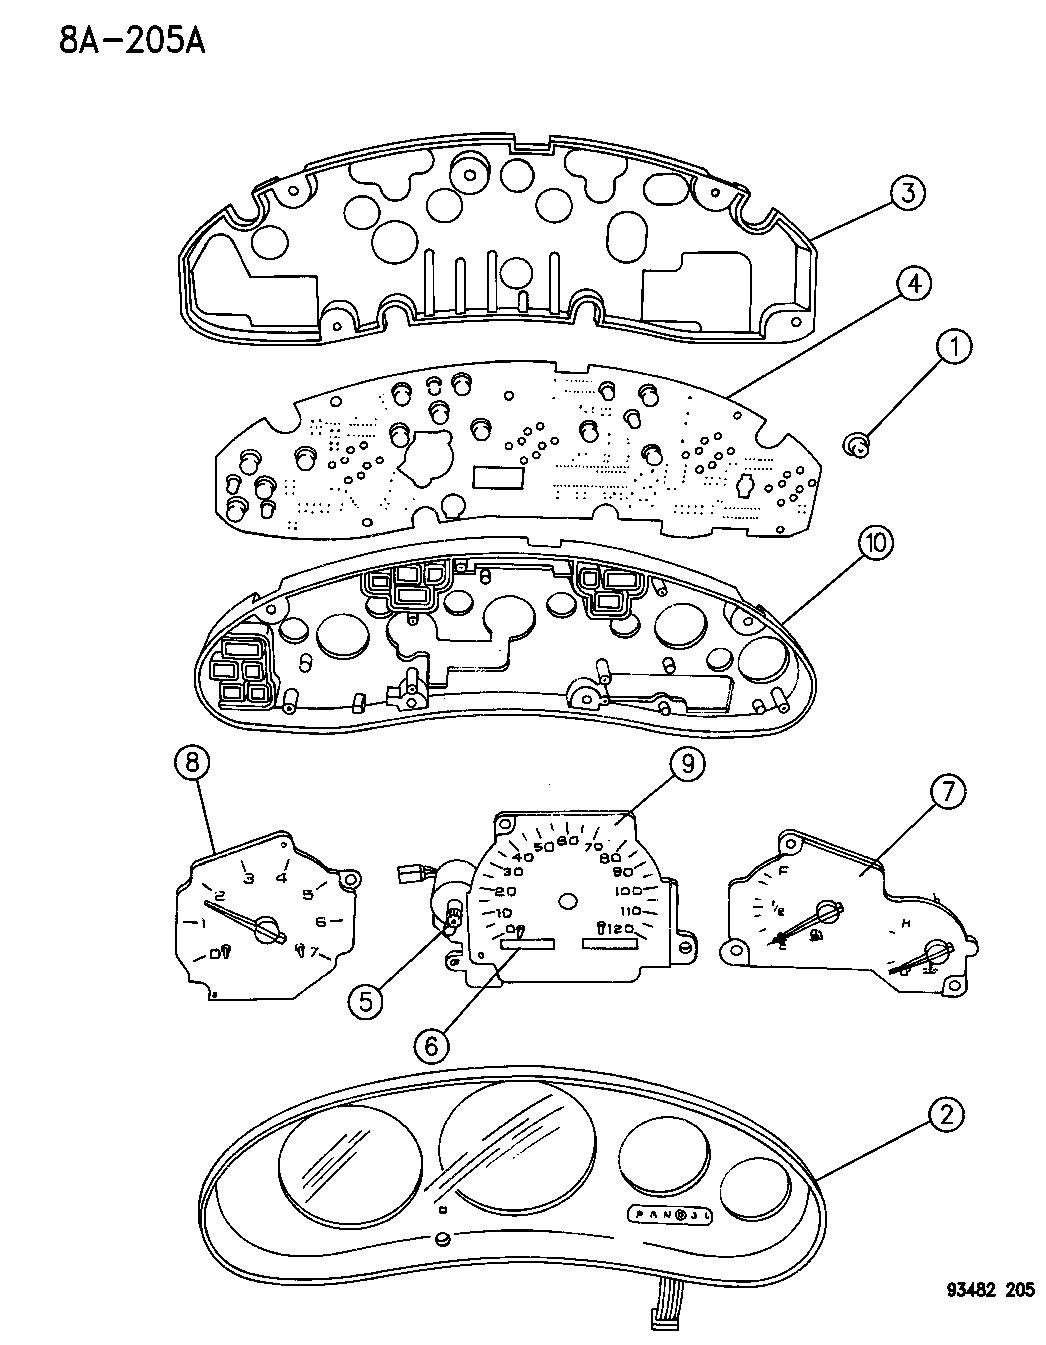 1995 Chrysler Concorde Cluster Instrument Panel 1993 Wiring Diagram Thumbnail 1